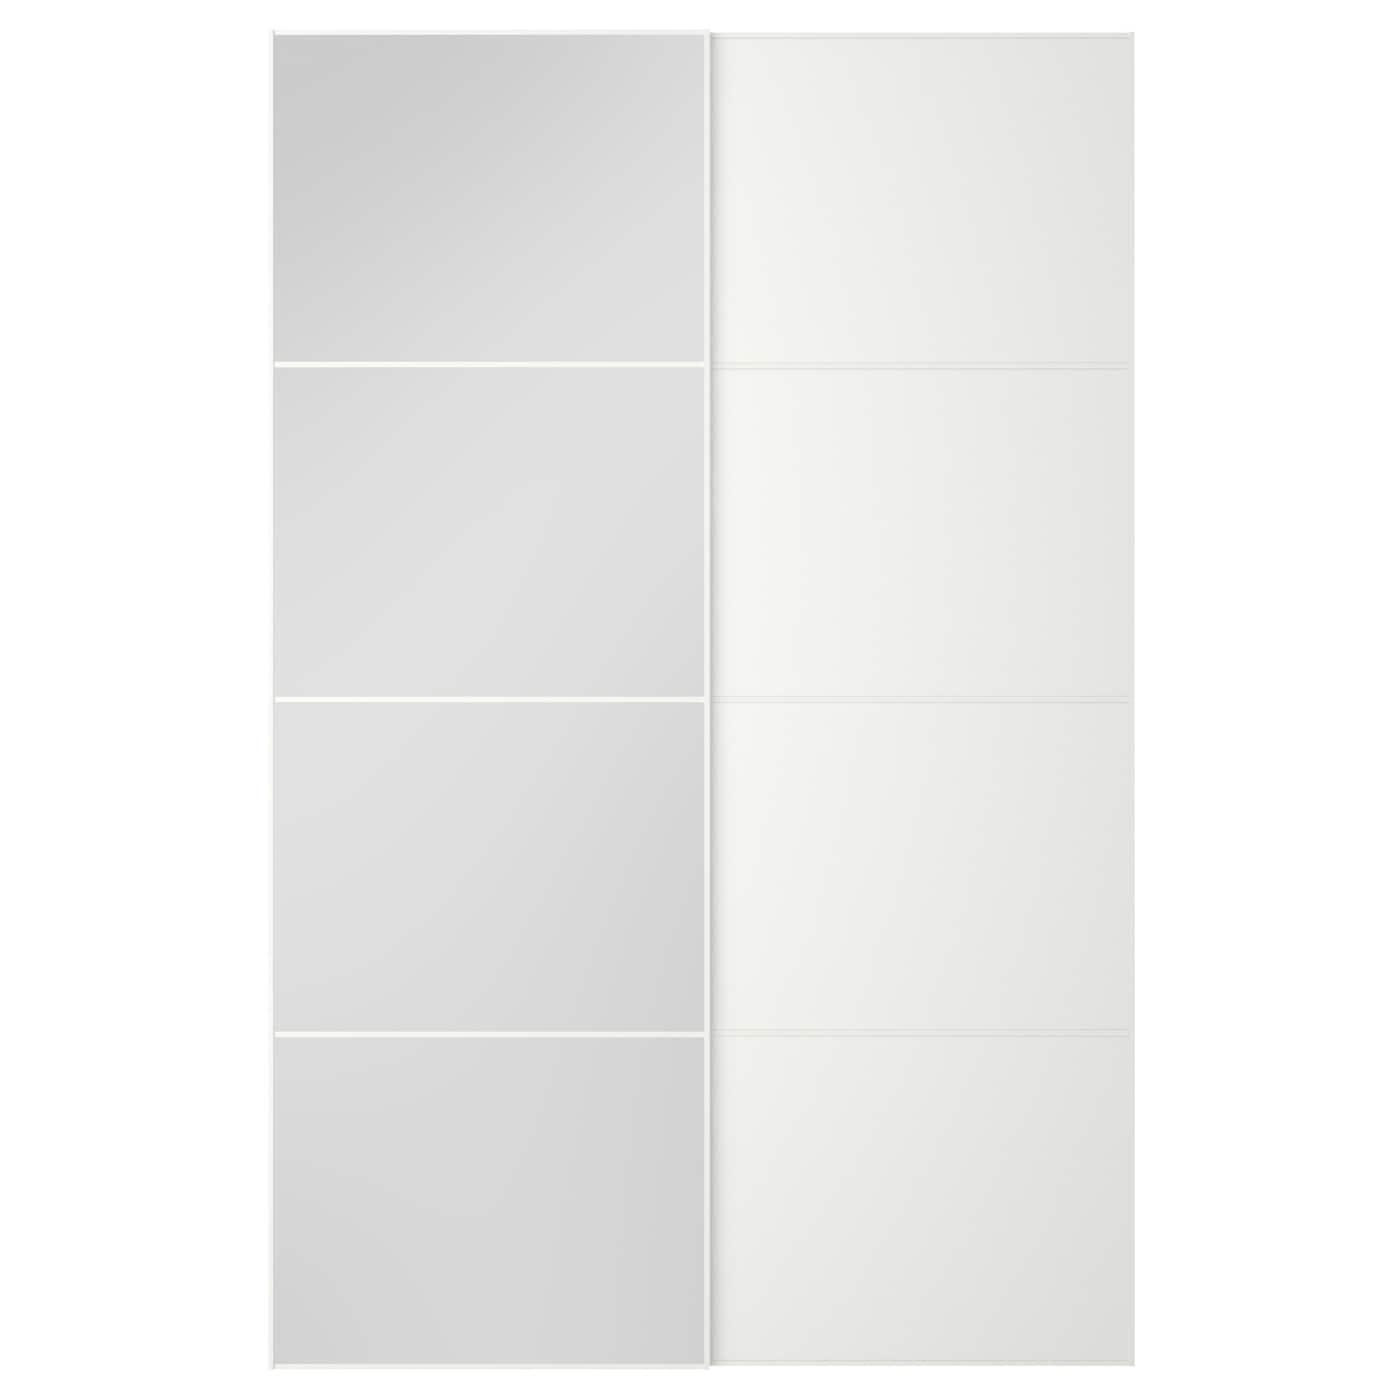 Mehamn auli puertas correderas 2 uds espejo blanco 150 x 236 cm ikea - Espejo blanco ikea ...